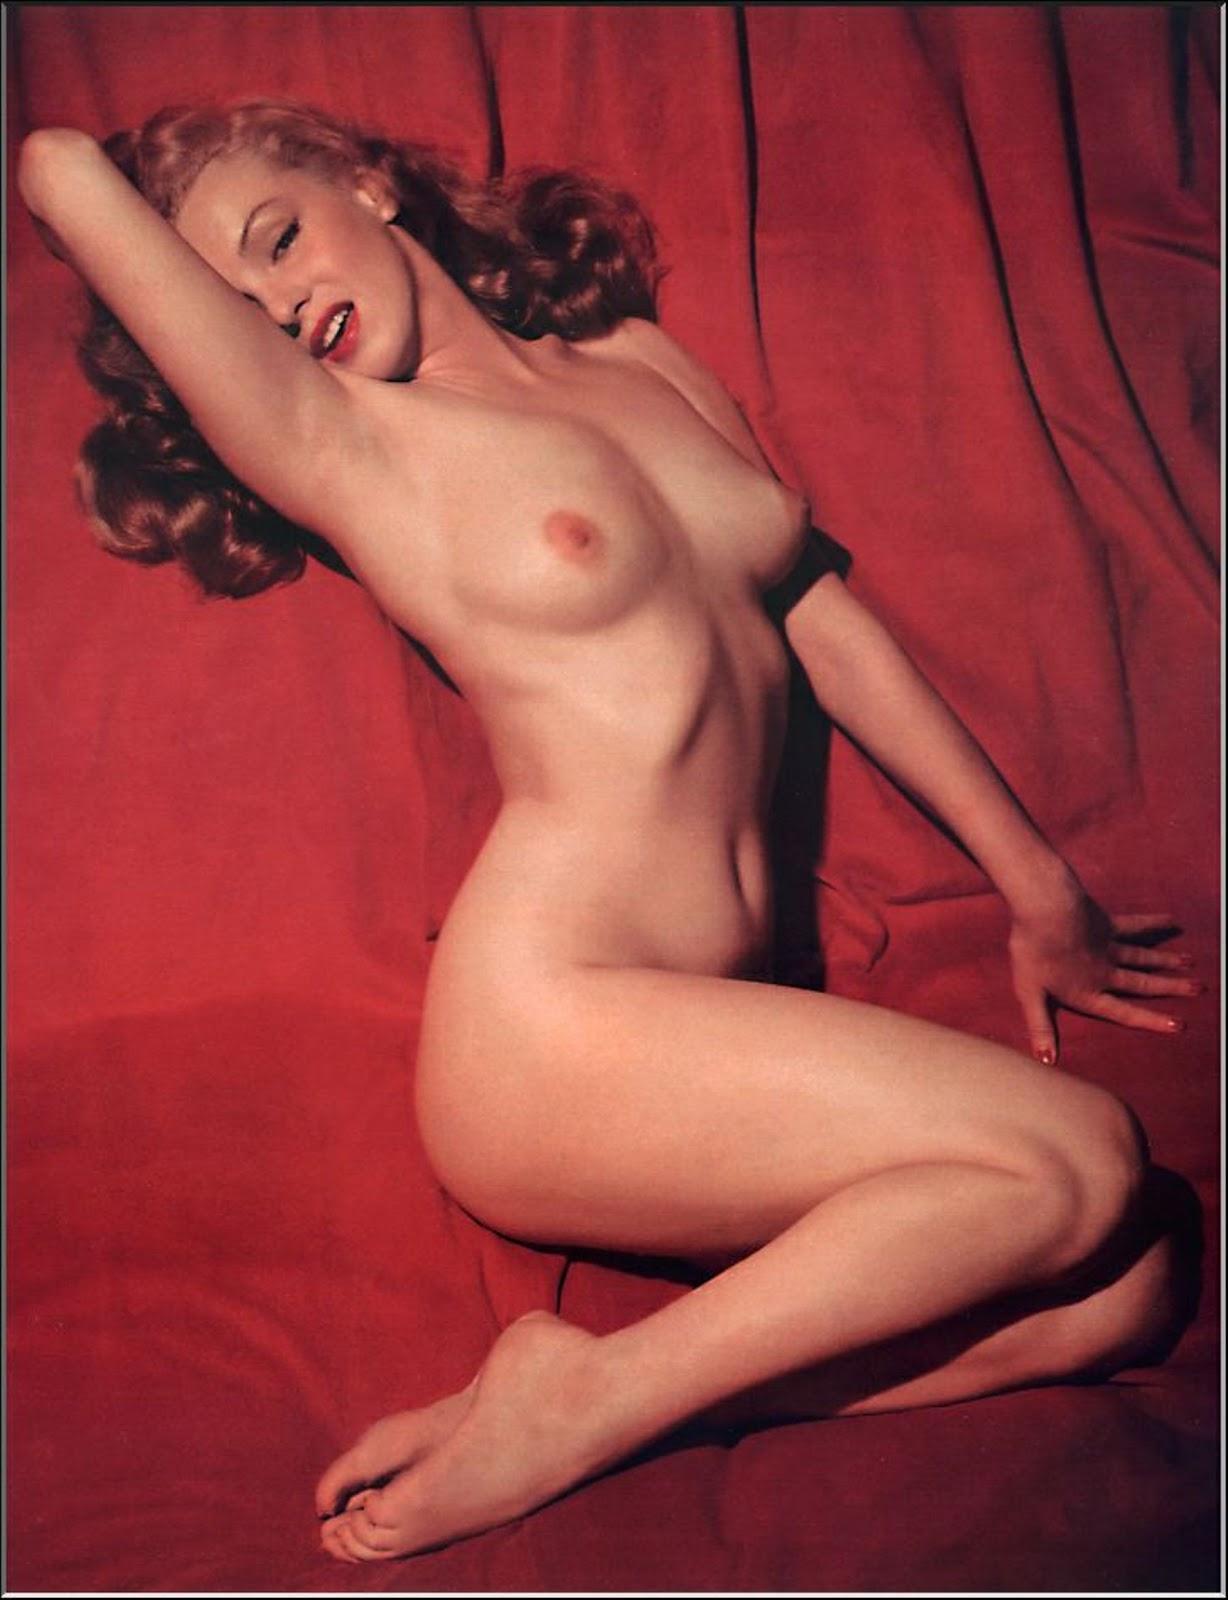 Fotos Los Desnudos De Marilyn Monroe Que Playboy Guard Por A Os